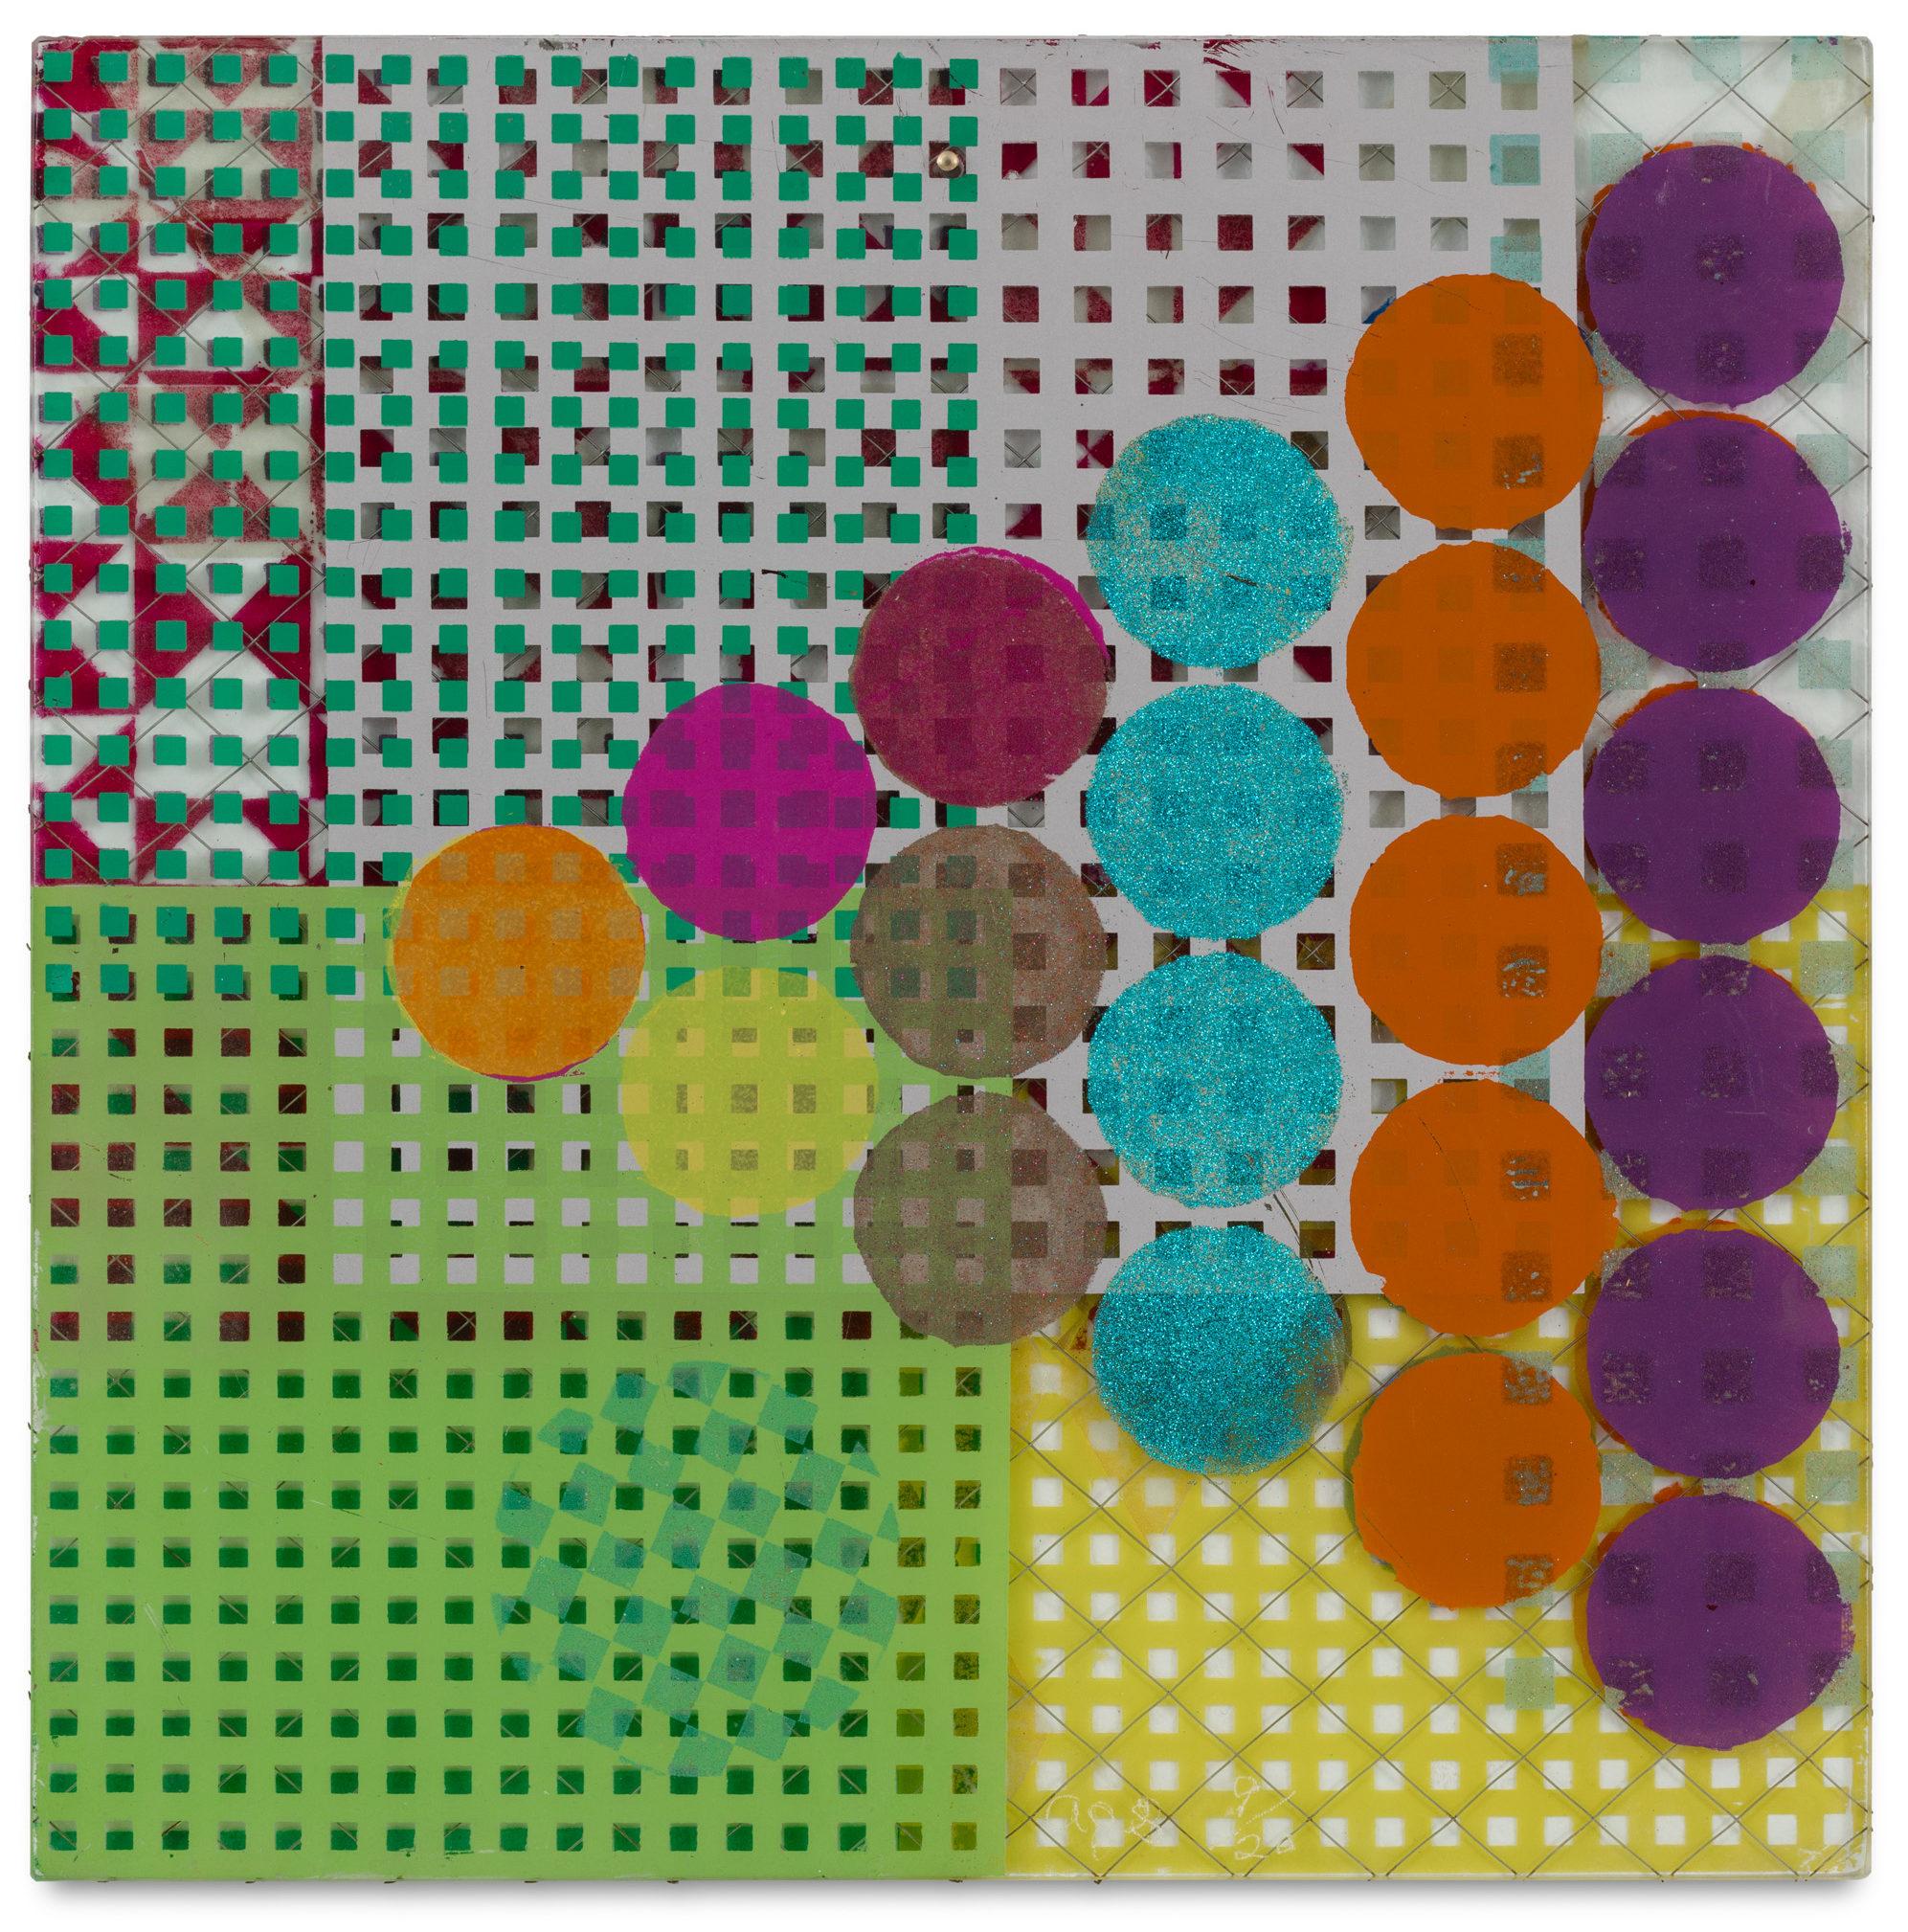 Alan Shields, Chicken Shit, 1974, Silkscreen on glass, 14 x 14 x 1/4 inches (35.6 x 35.6 x .6 cm), courtesy of Van Doren Waxter